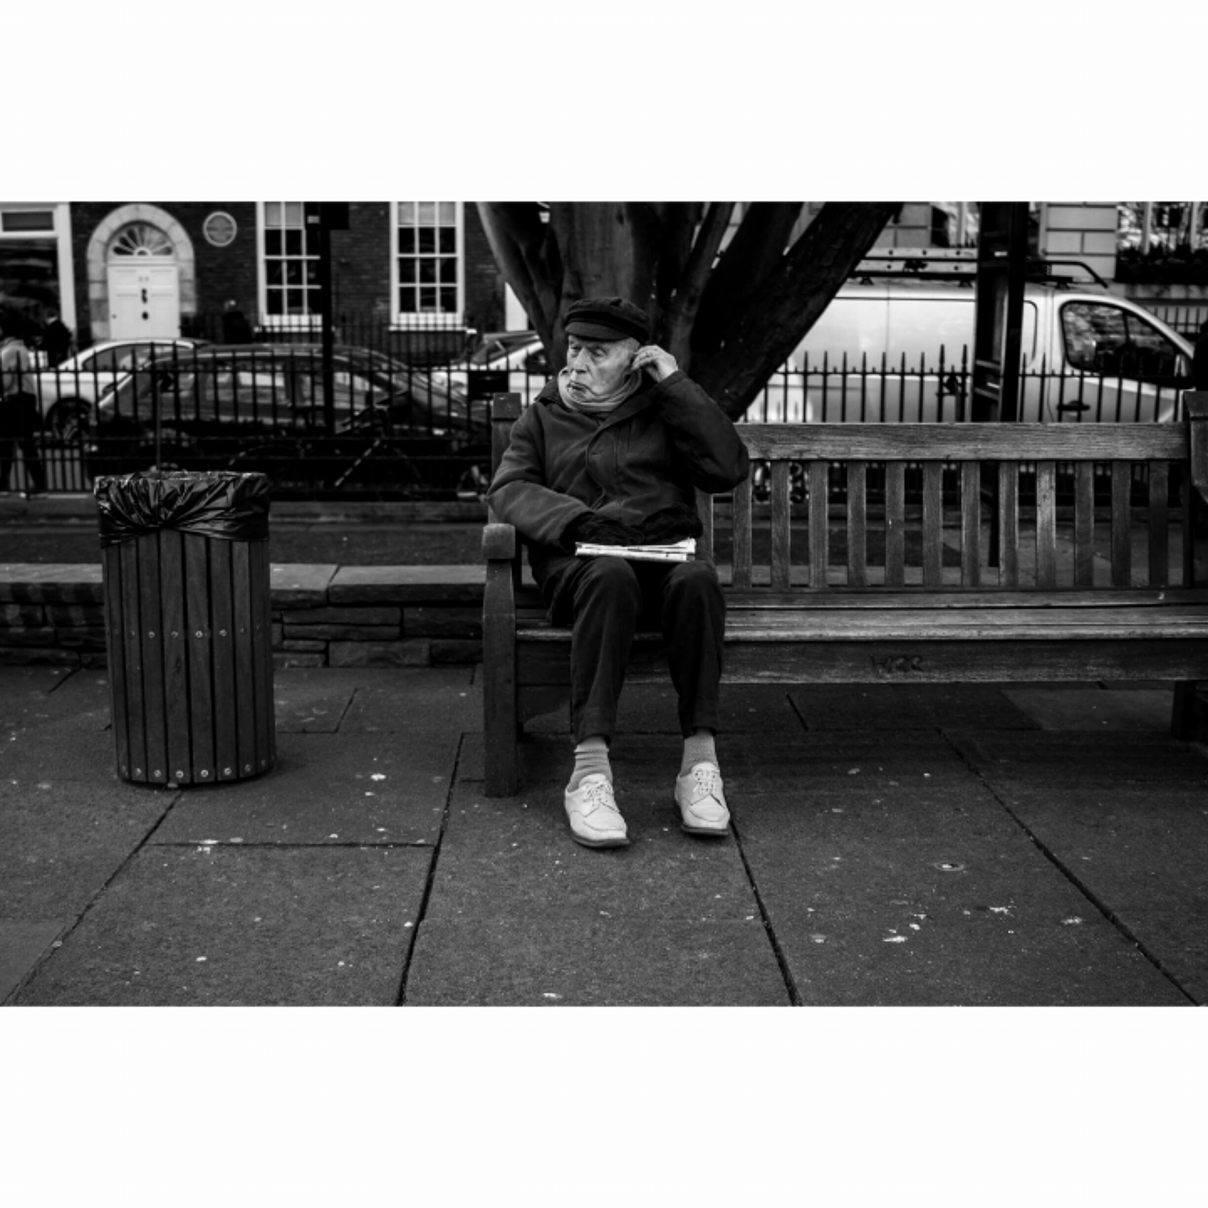 Bench, London - January 2017